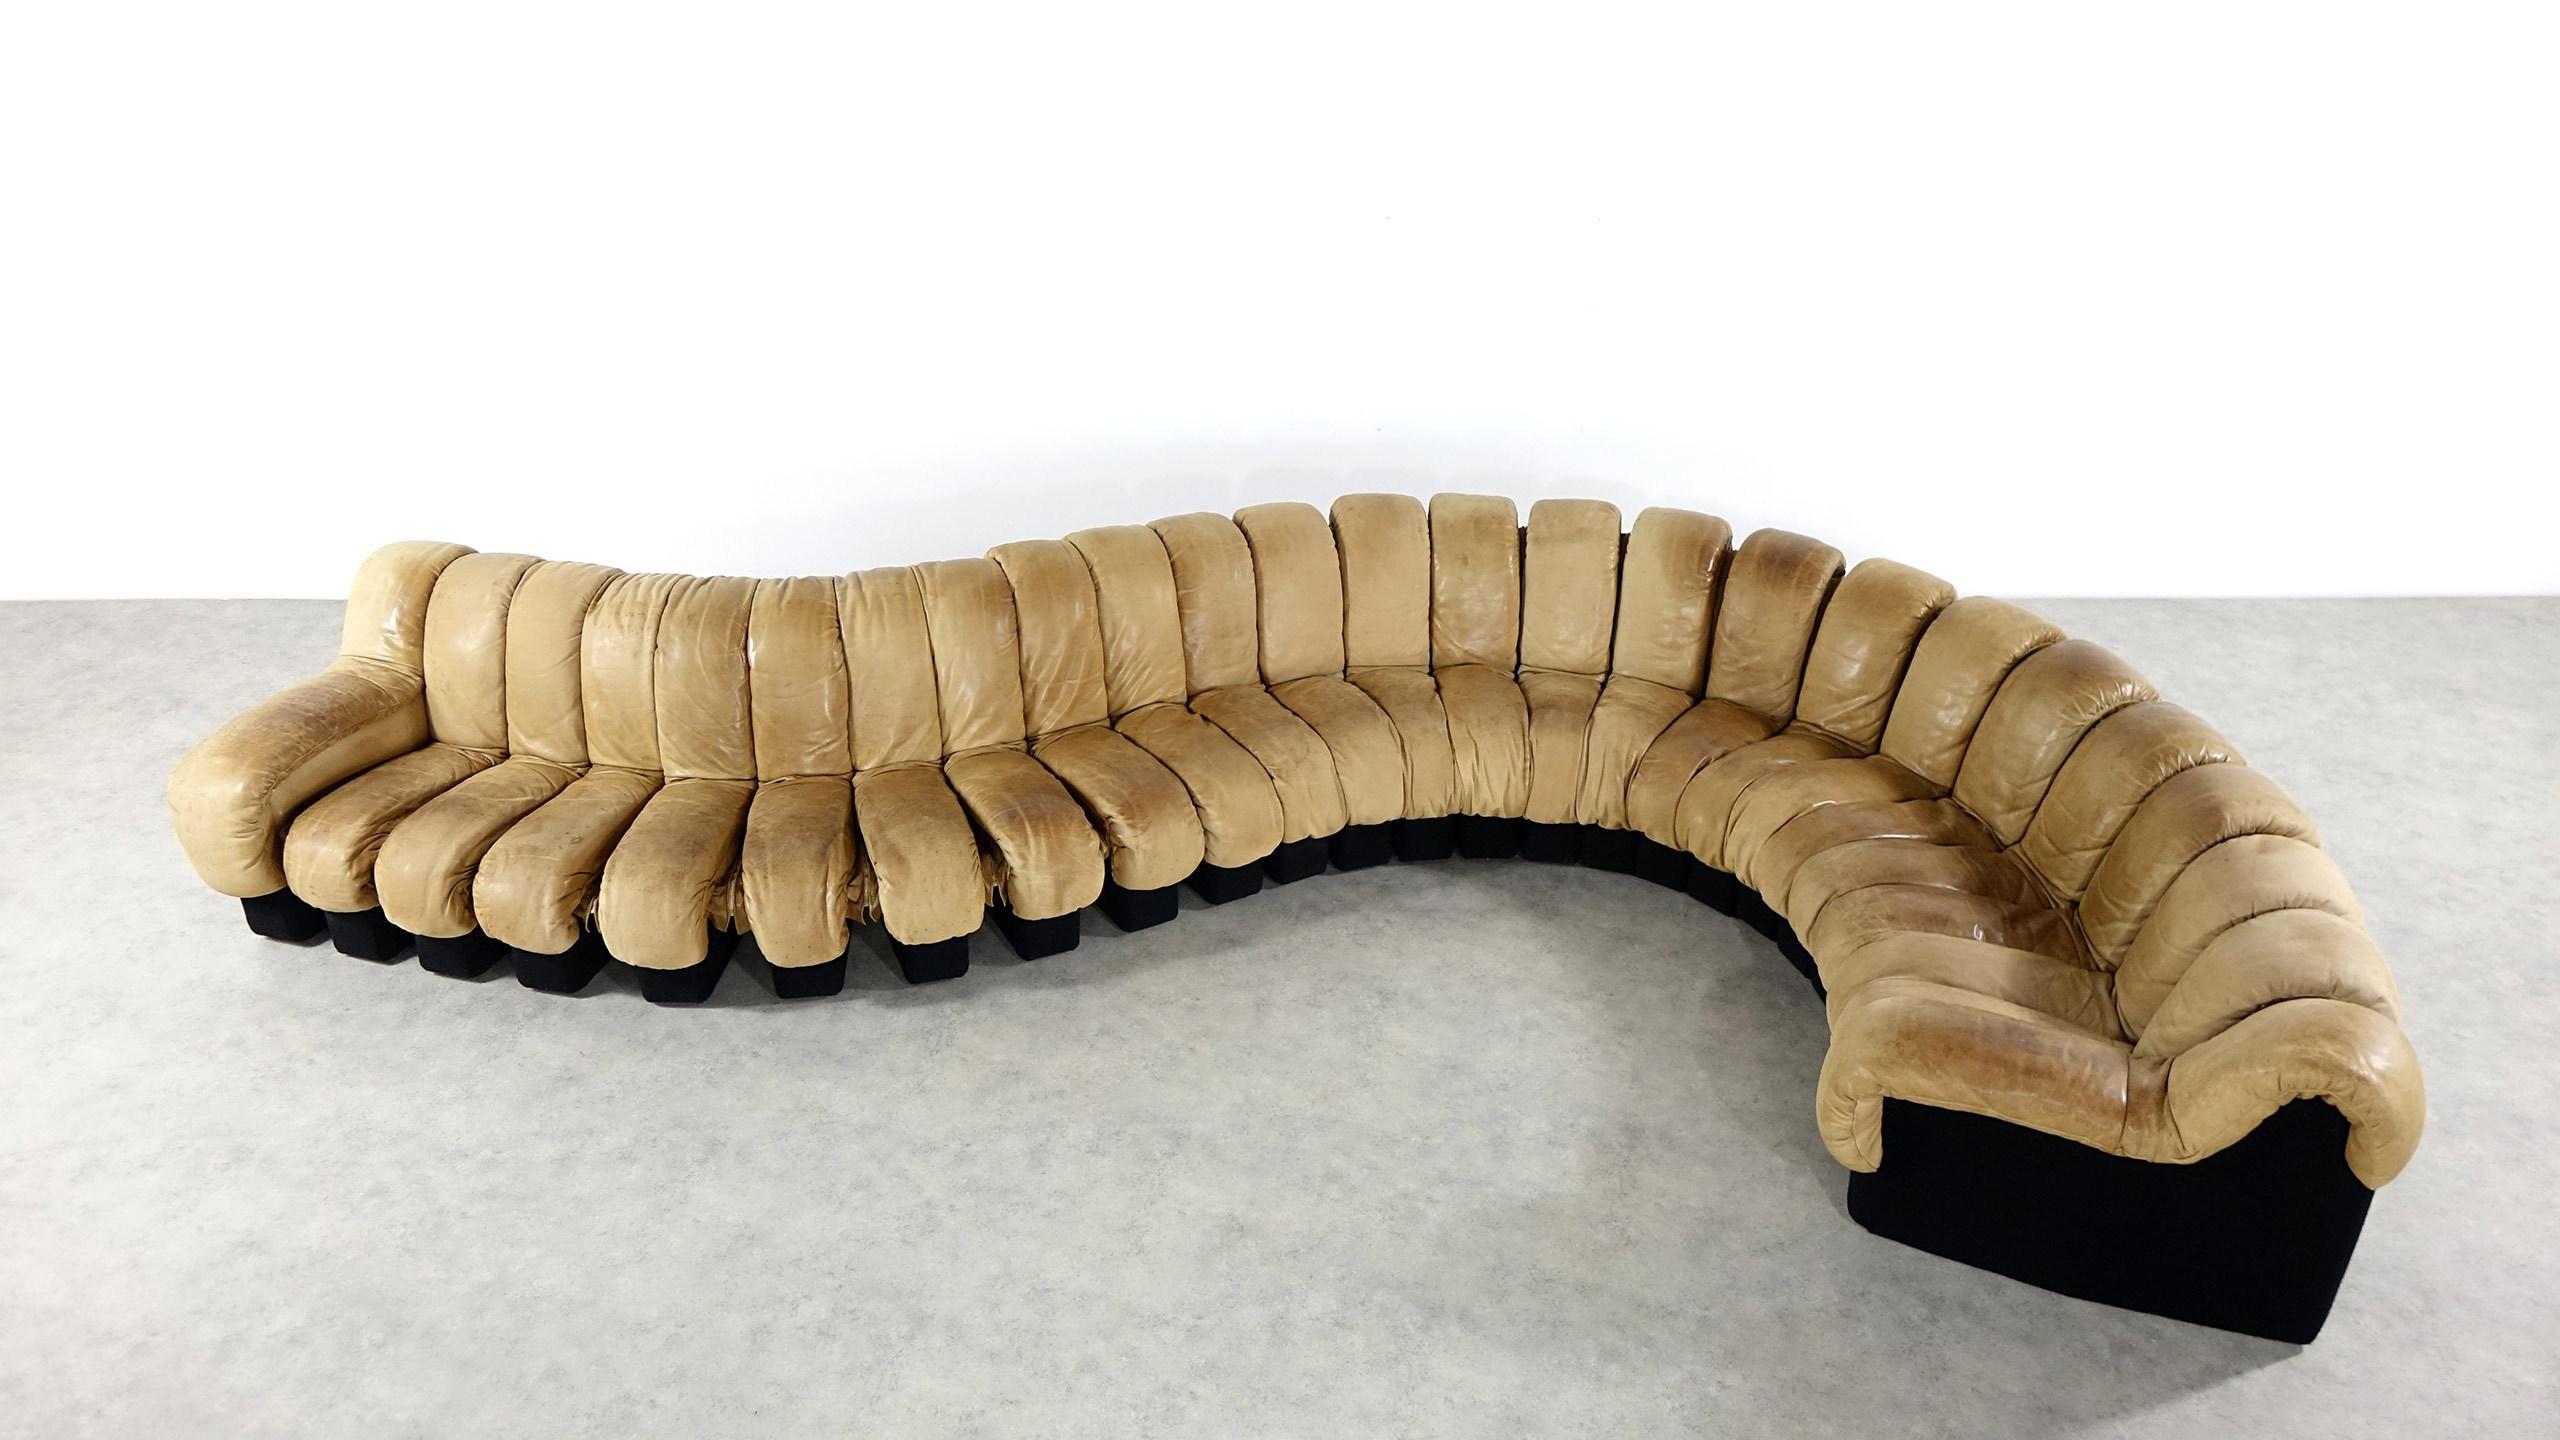 de sede ds 600 sofa 25 elements in leather zorrobot. Black Bedroom Furniture Sets. Home Design Ideas